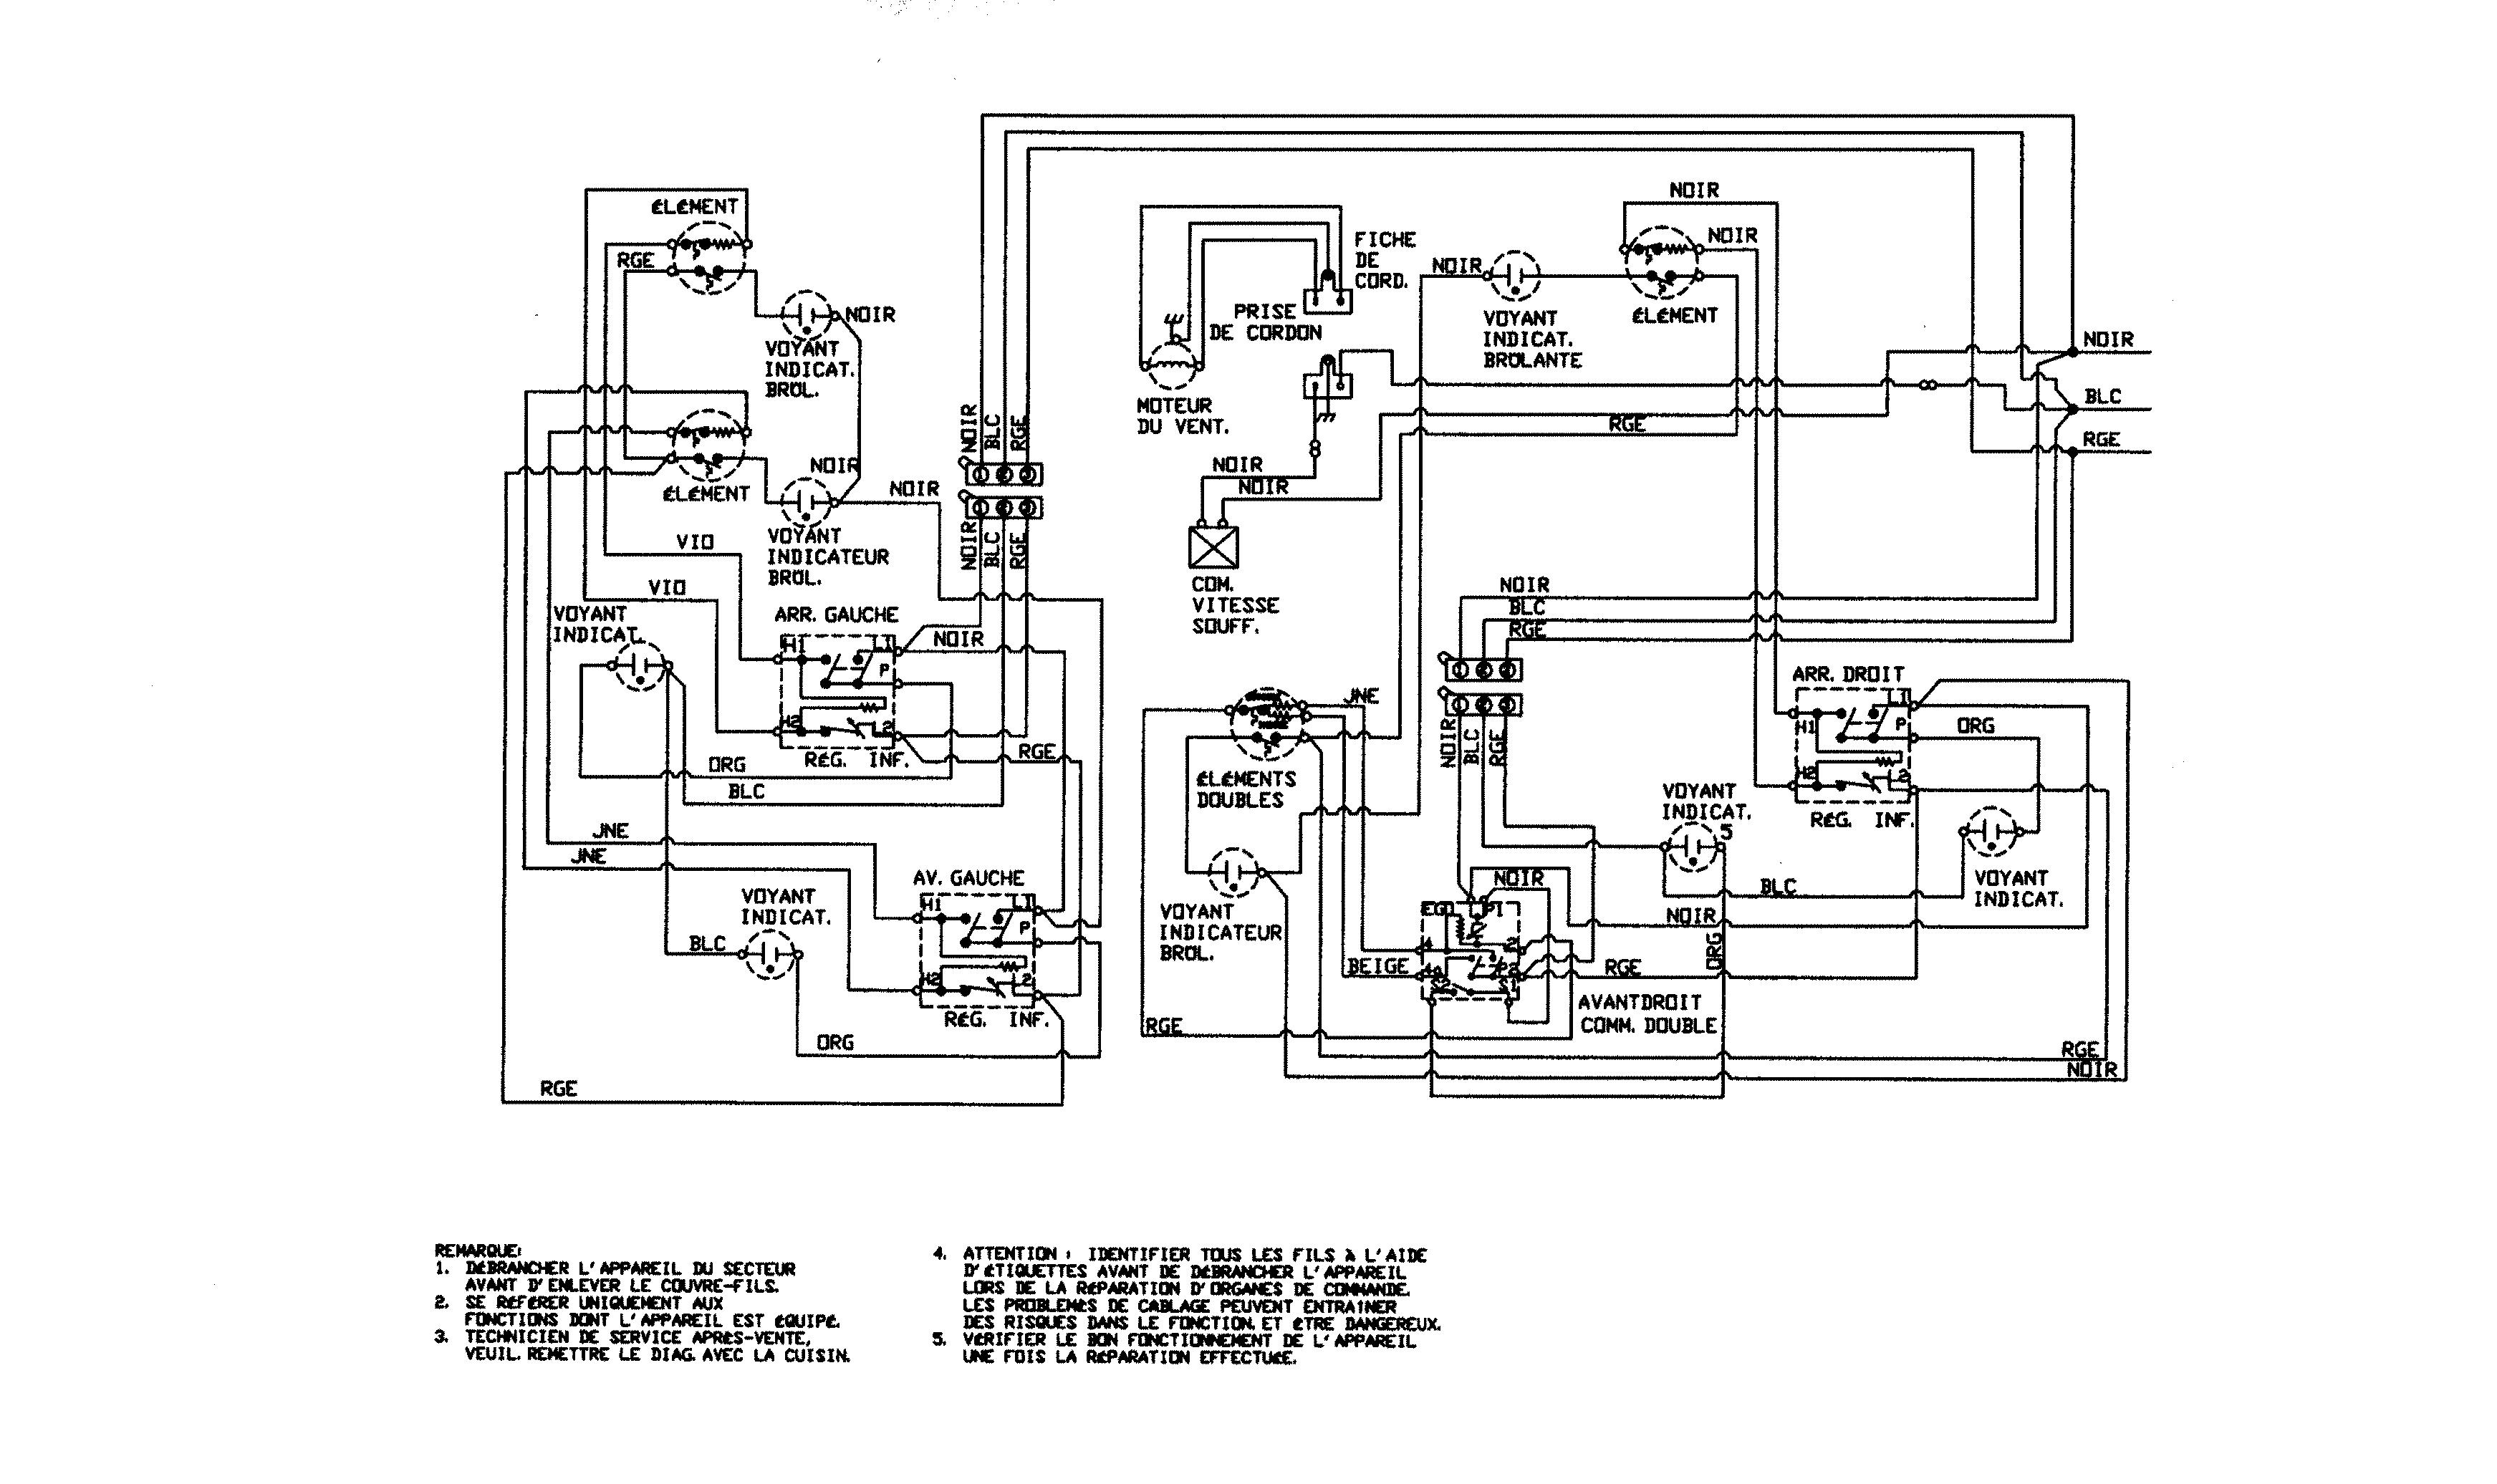 jenn air jed8430bdb wiring information frch diagram [ 3486 x 2072 Pixel ]